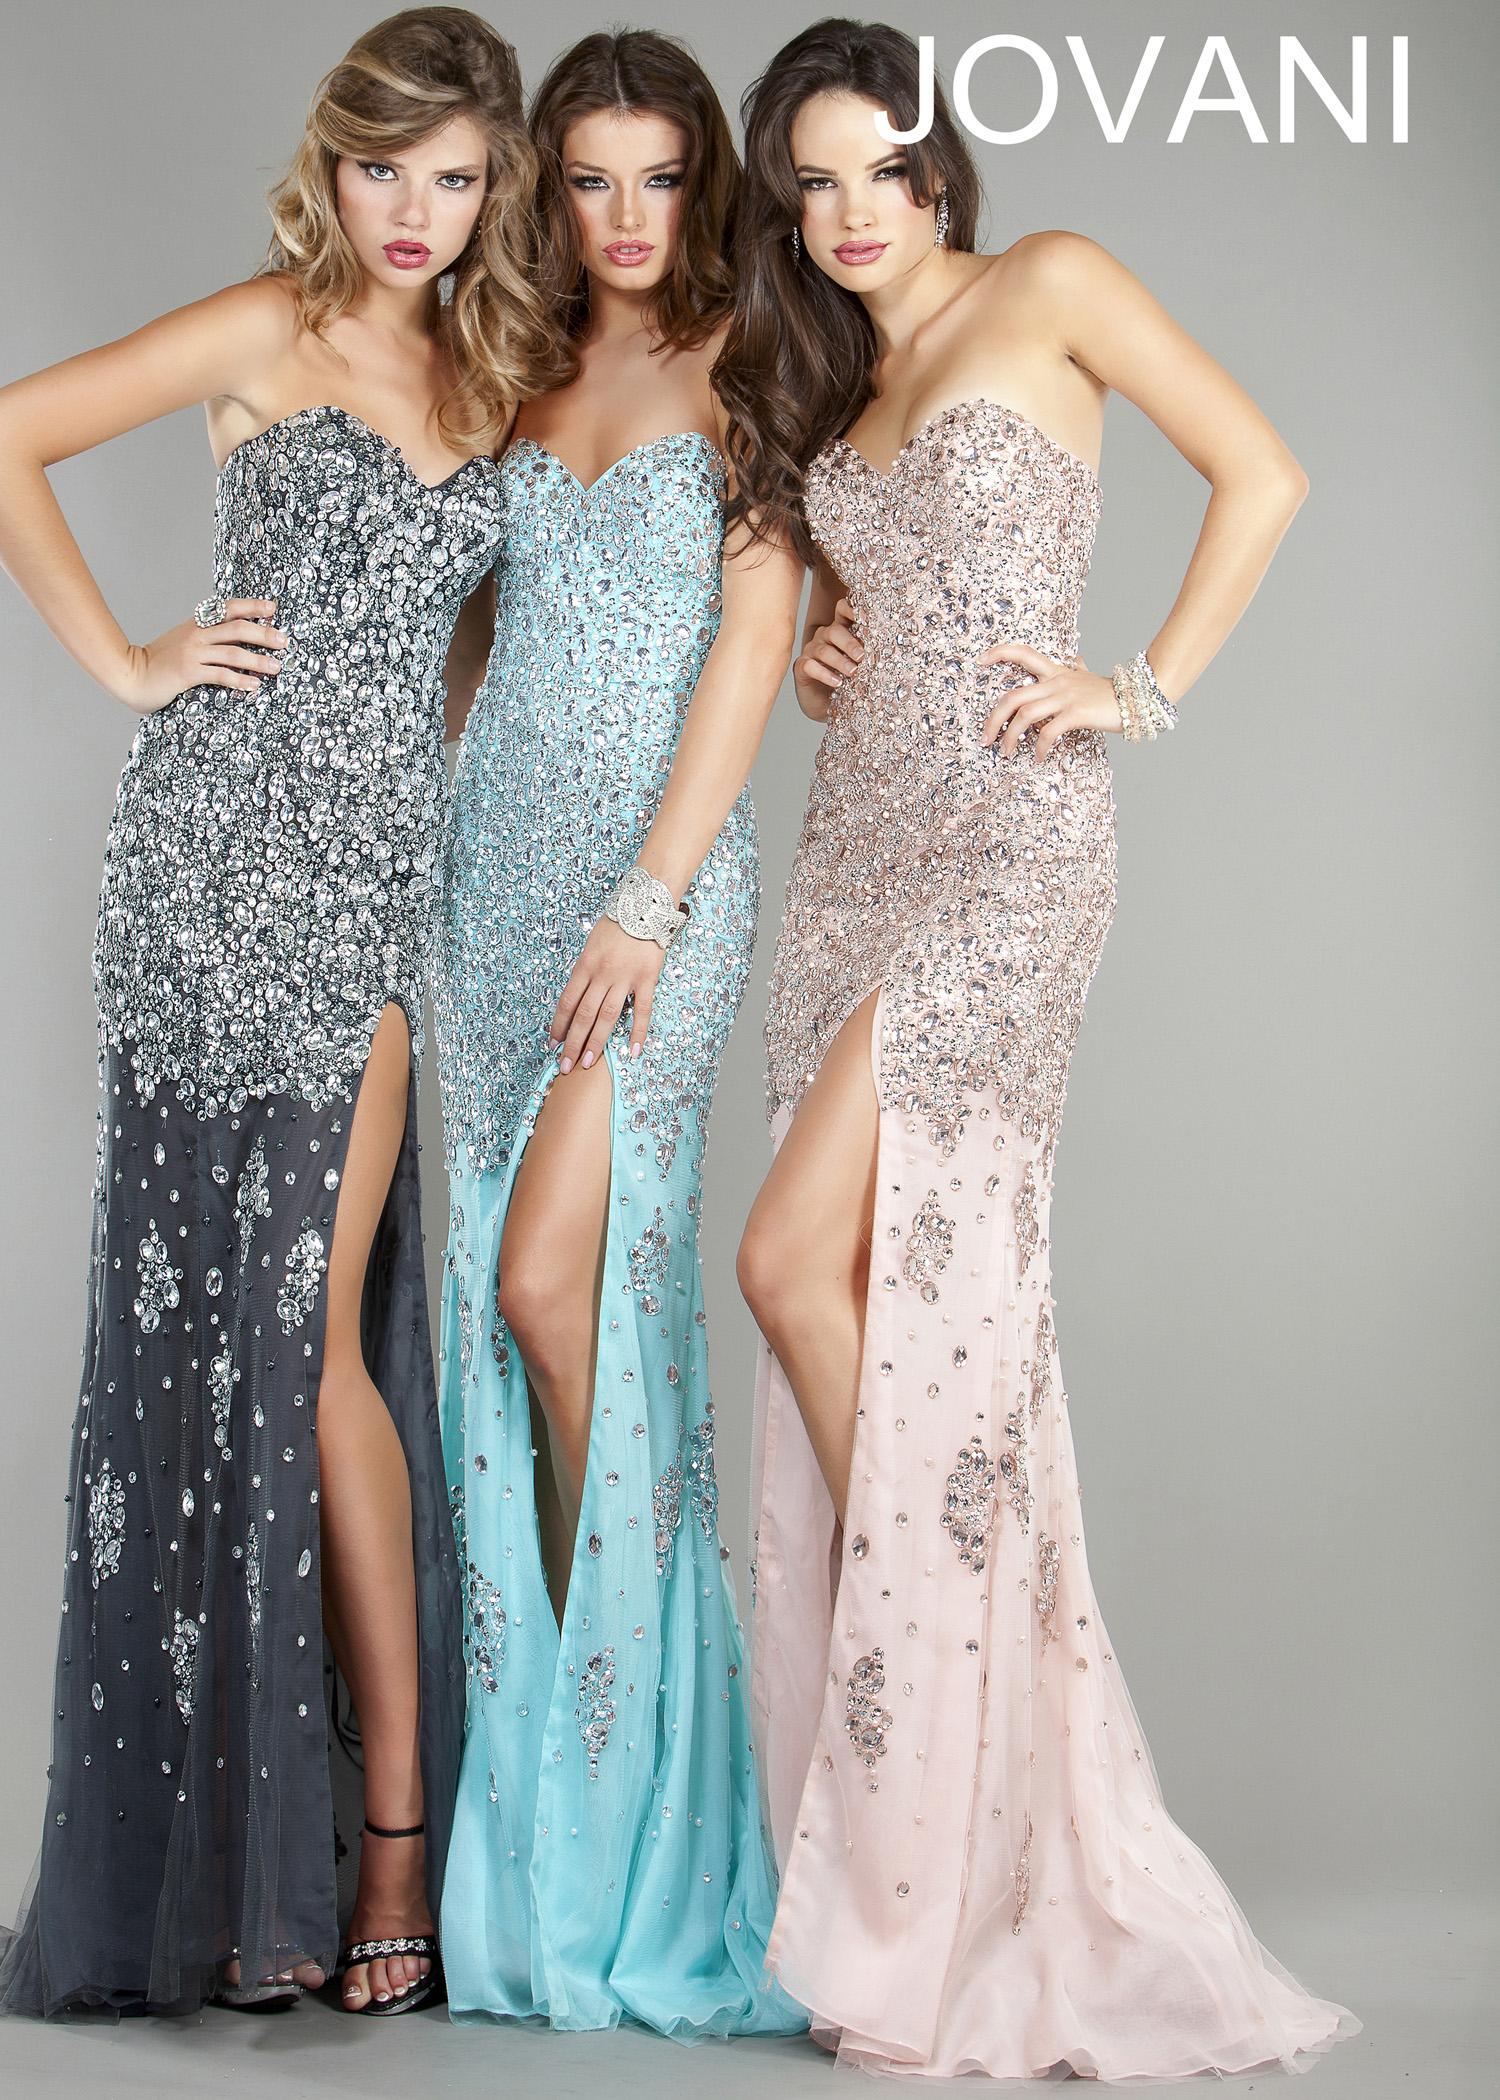 Gunmetal, aqua, pink beaded strapless evening dress, prom dresses 2013